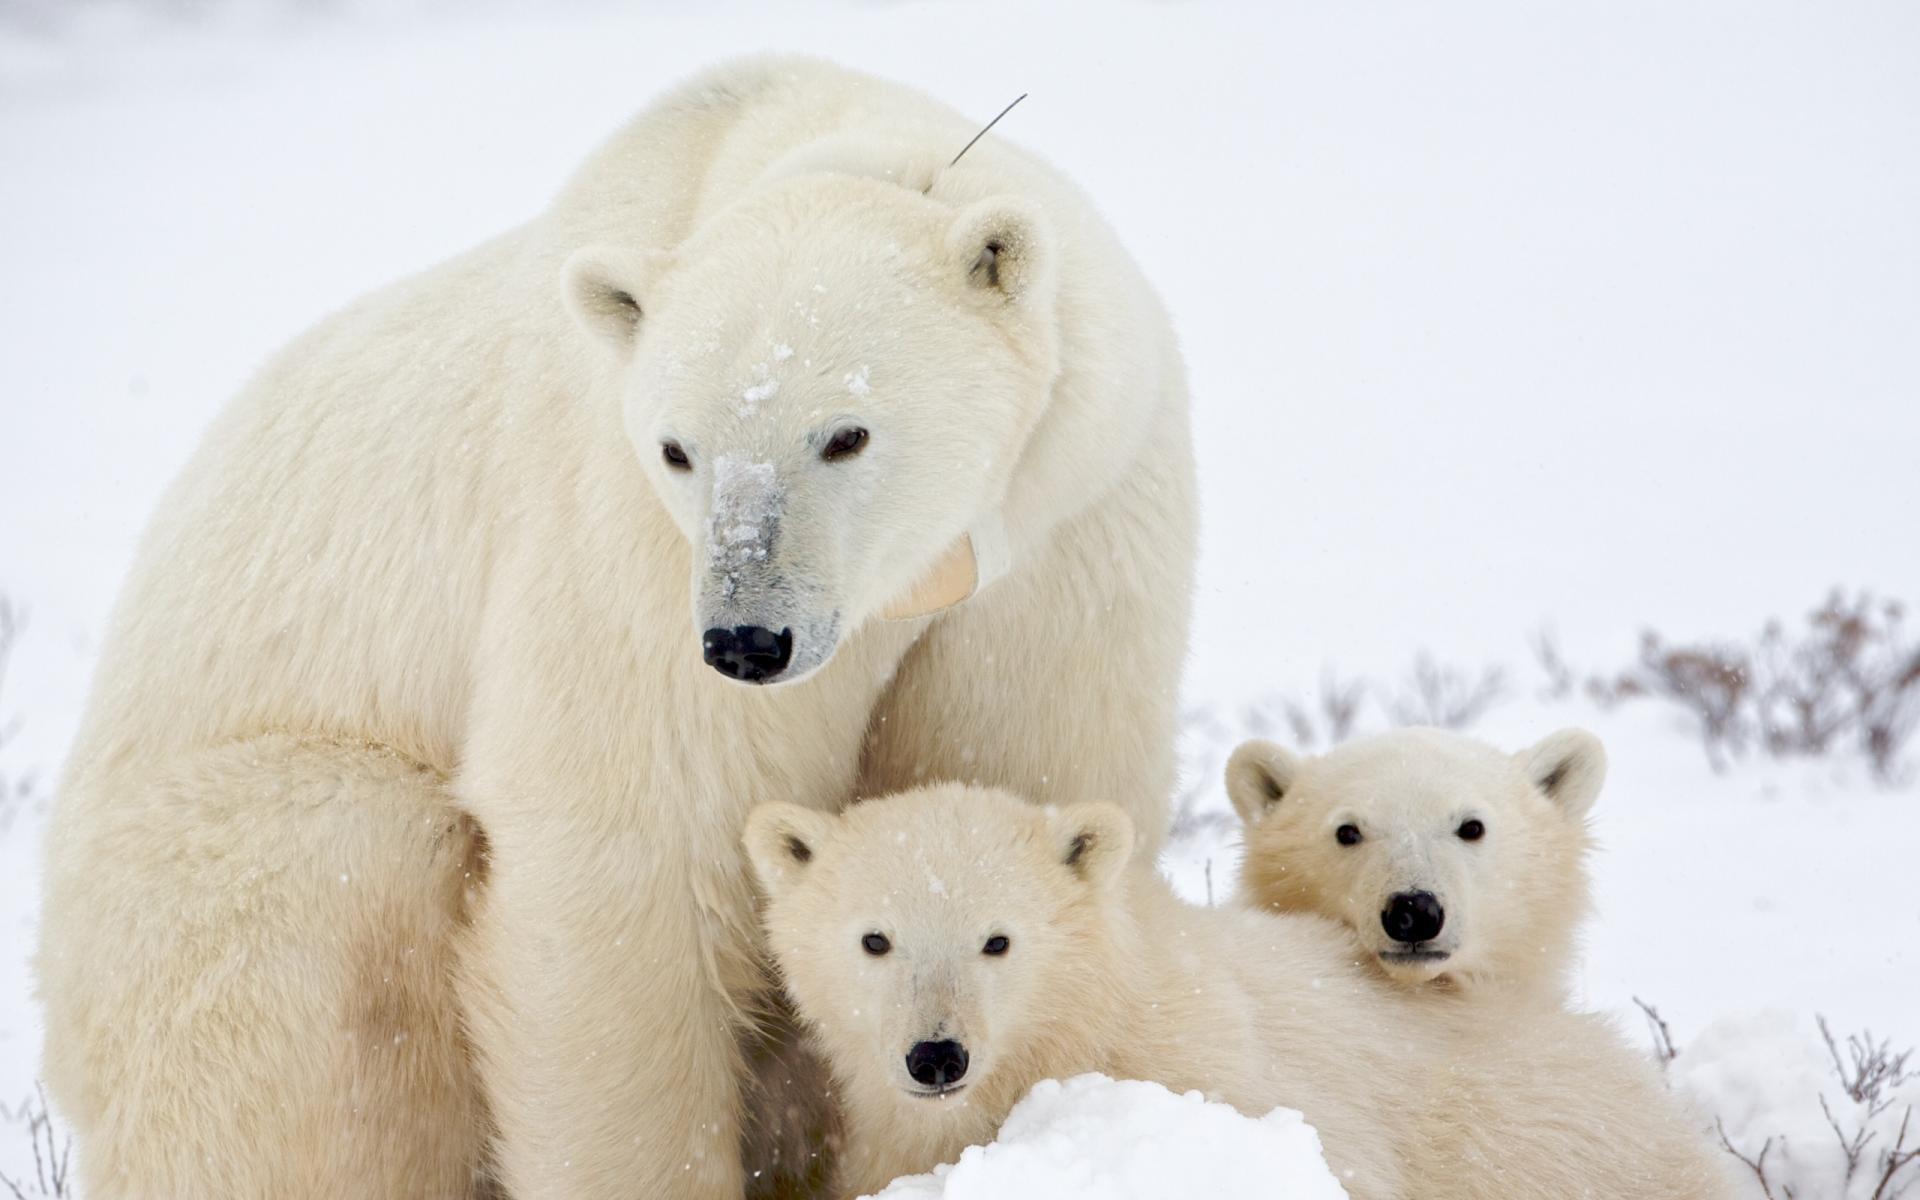 медвежатами с фото медведь белый